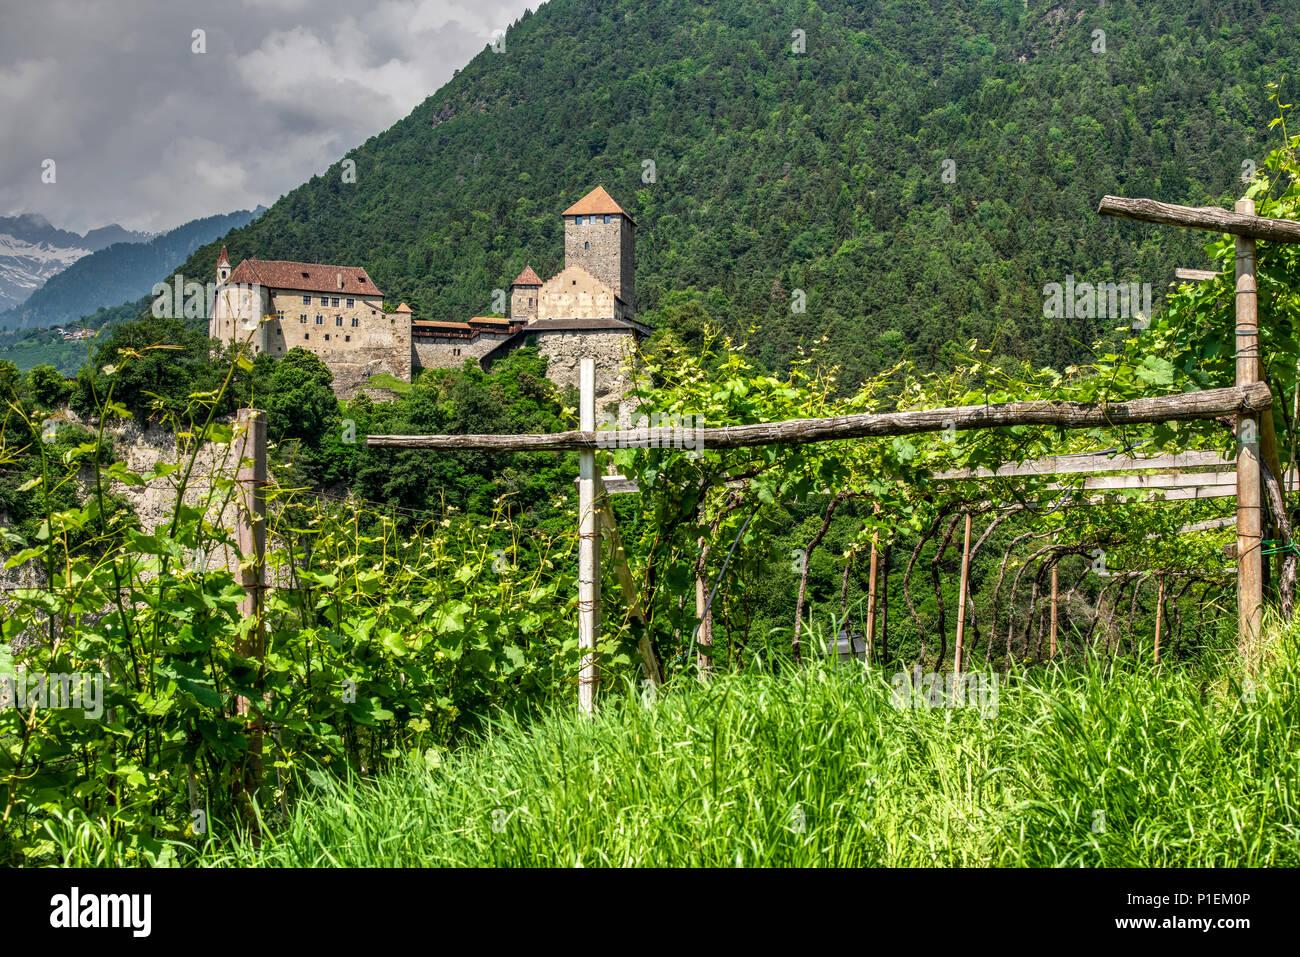 Tirol Castle or Castel Tirolo, Tirolo - Tirol, Trentino Alto Adige - South Tyrol, Italy - Stock Image